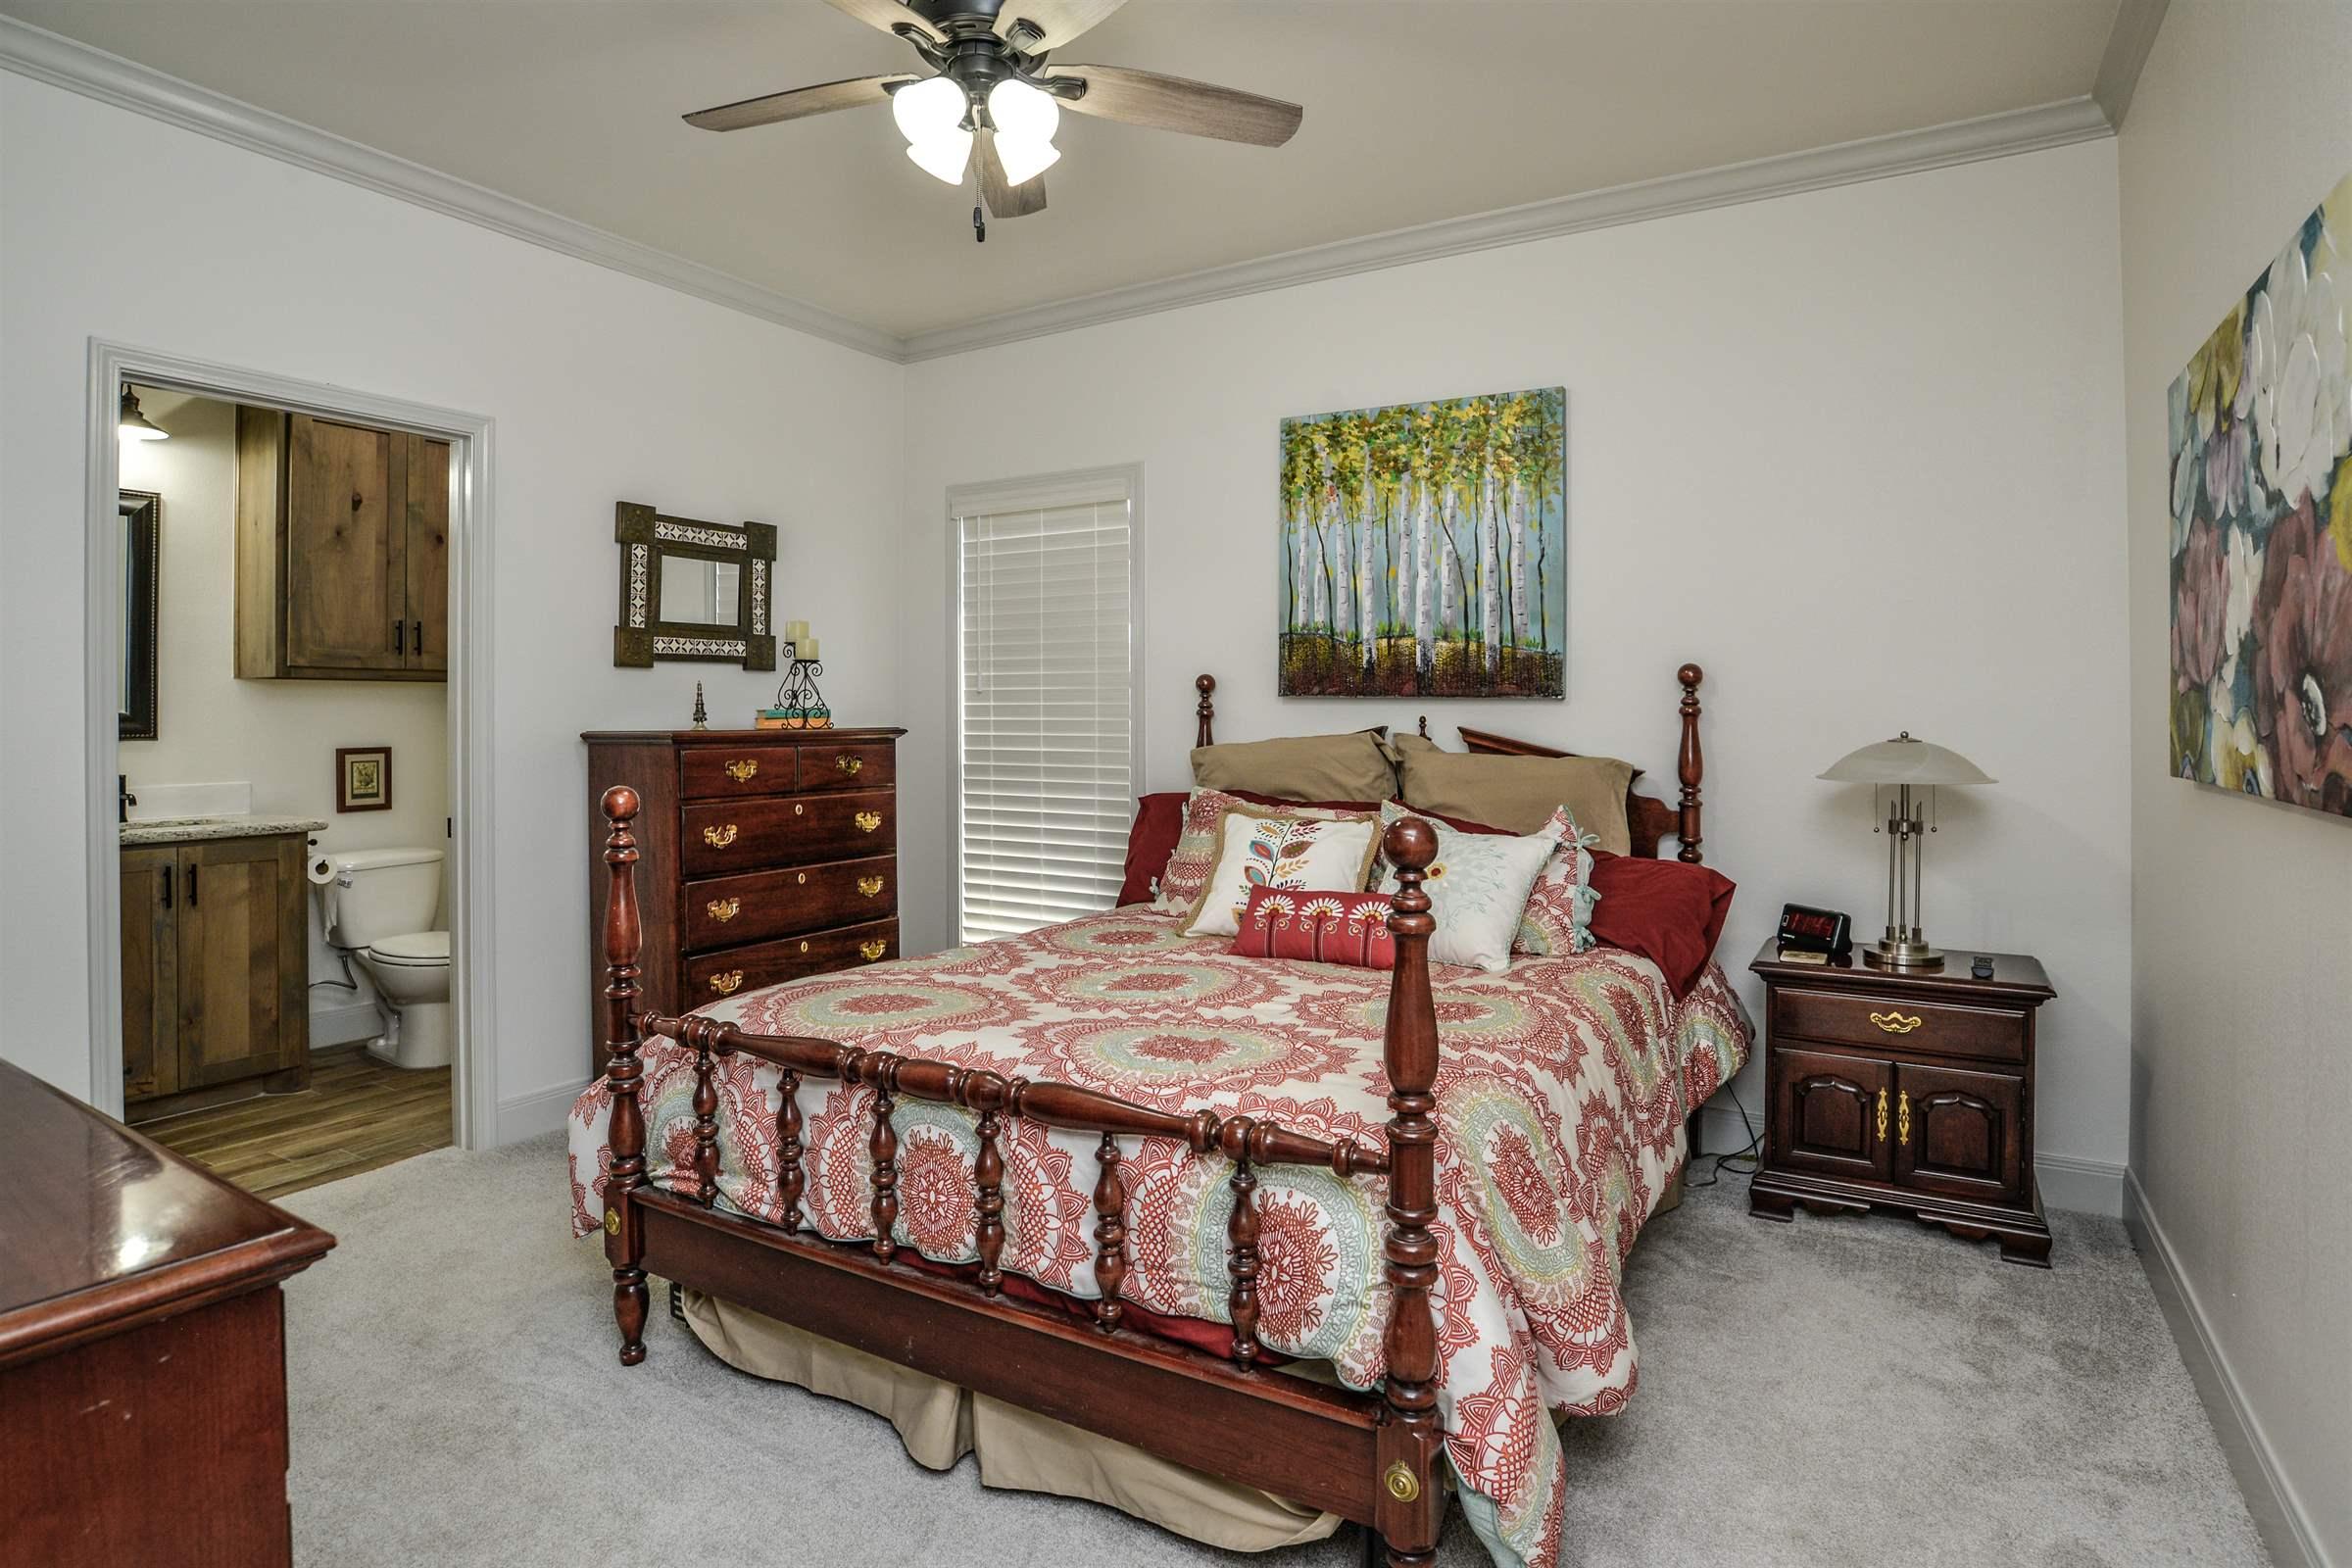 6954 102nd St, Lubbock, TX 79424